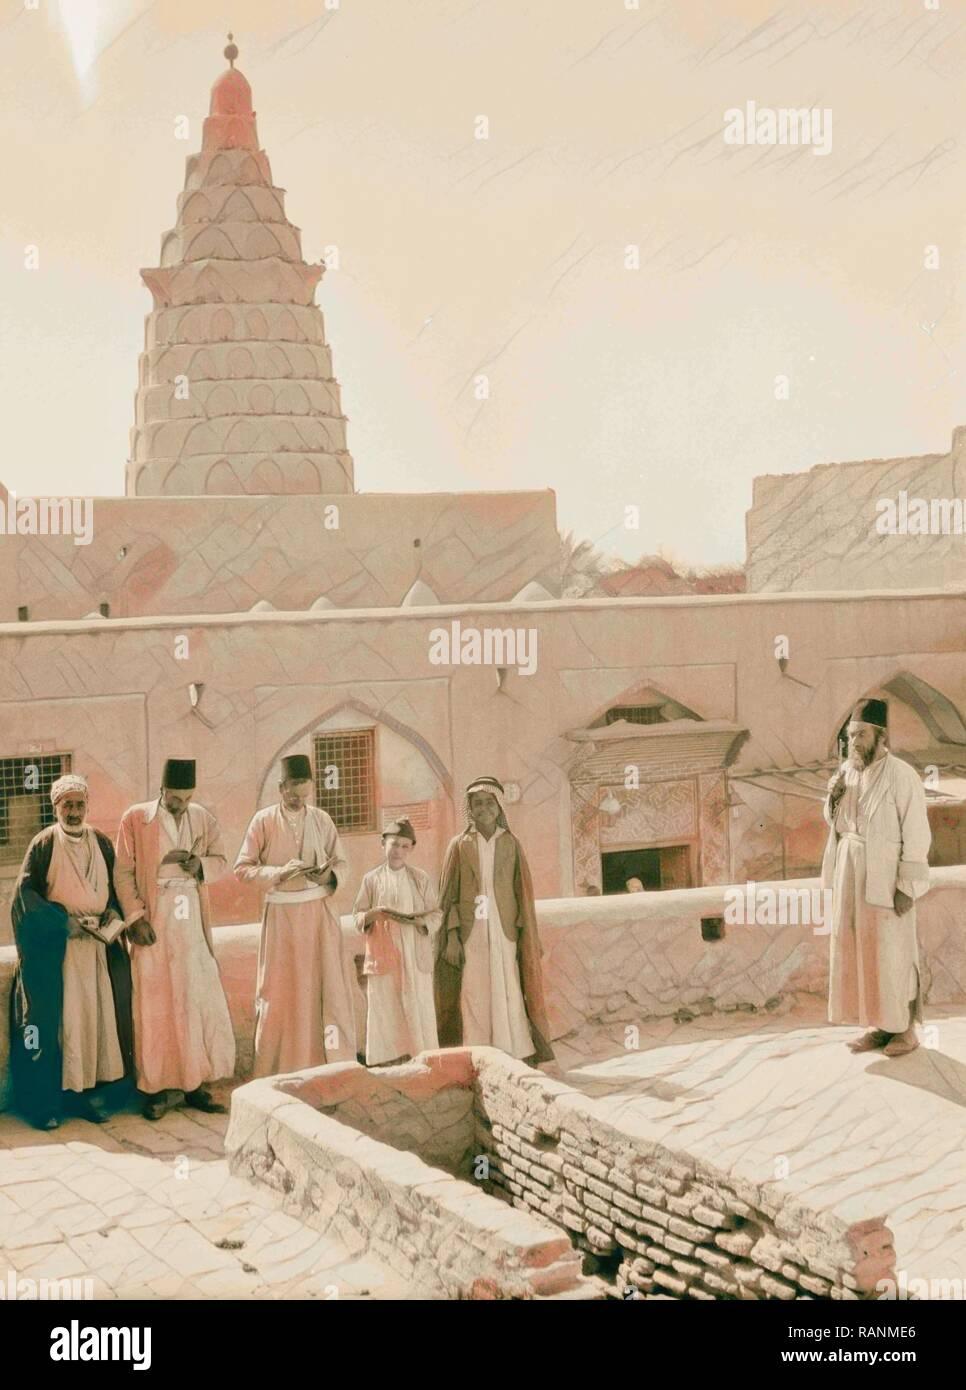 Kifl. Native Muslim village with a Jewish shrine to the prophet Ezekiel. Ezekiel's tomb with rabbi caretakers. 1932 reimagined - Stock Image